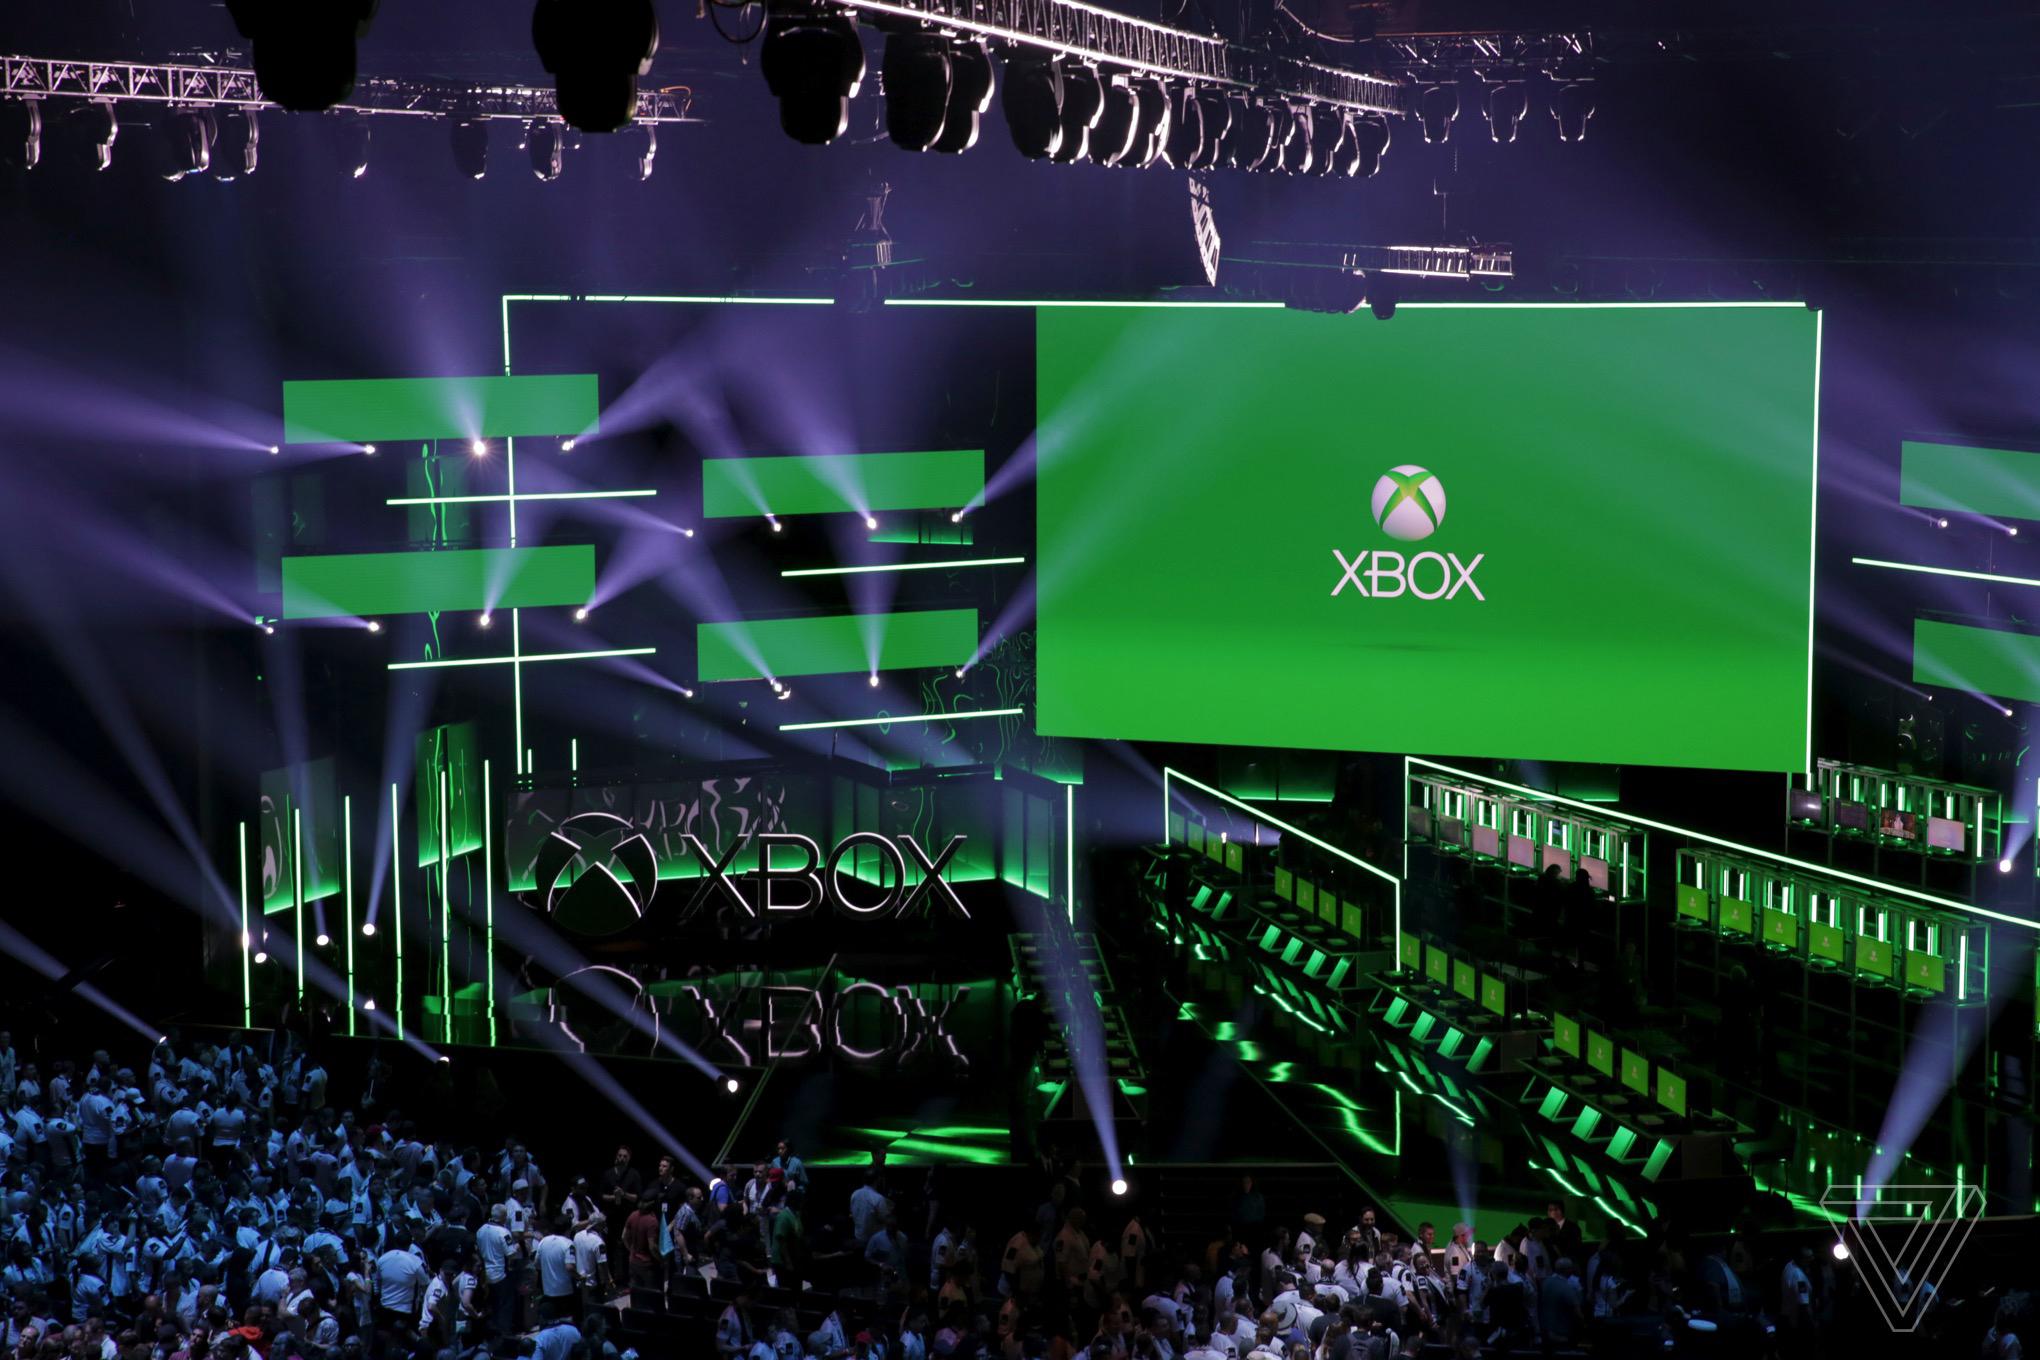 Watch Microsoft Xbox press conference at E3 2019: start time